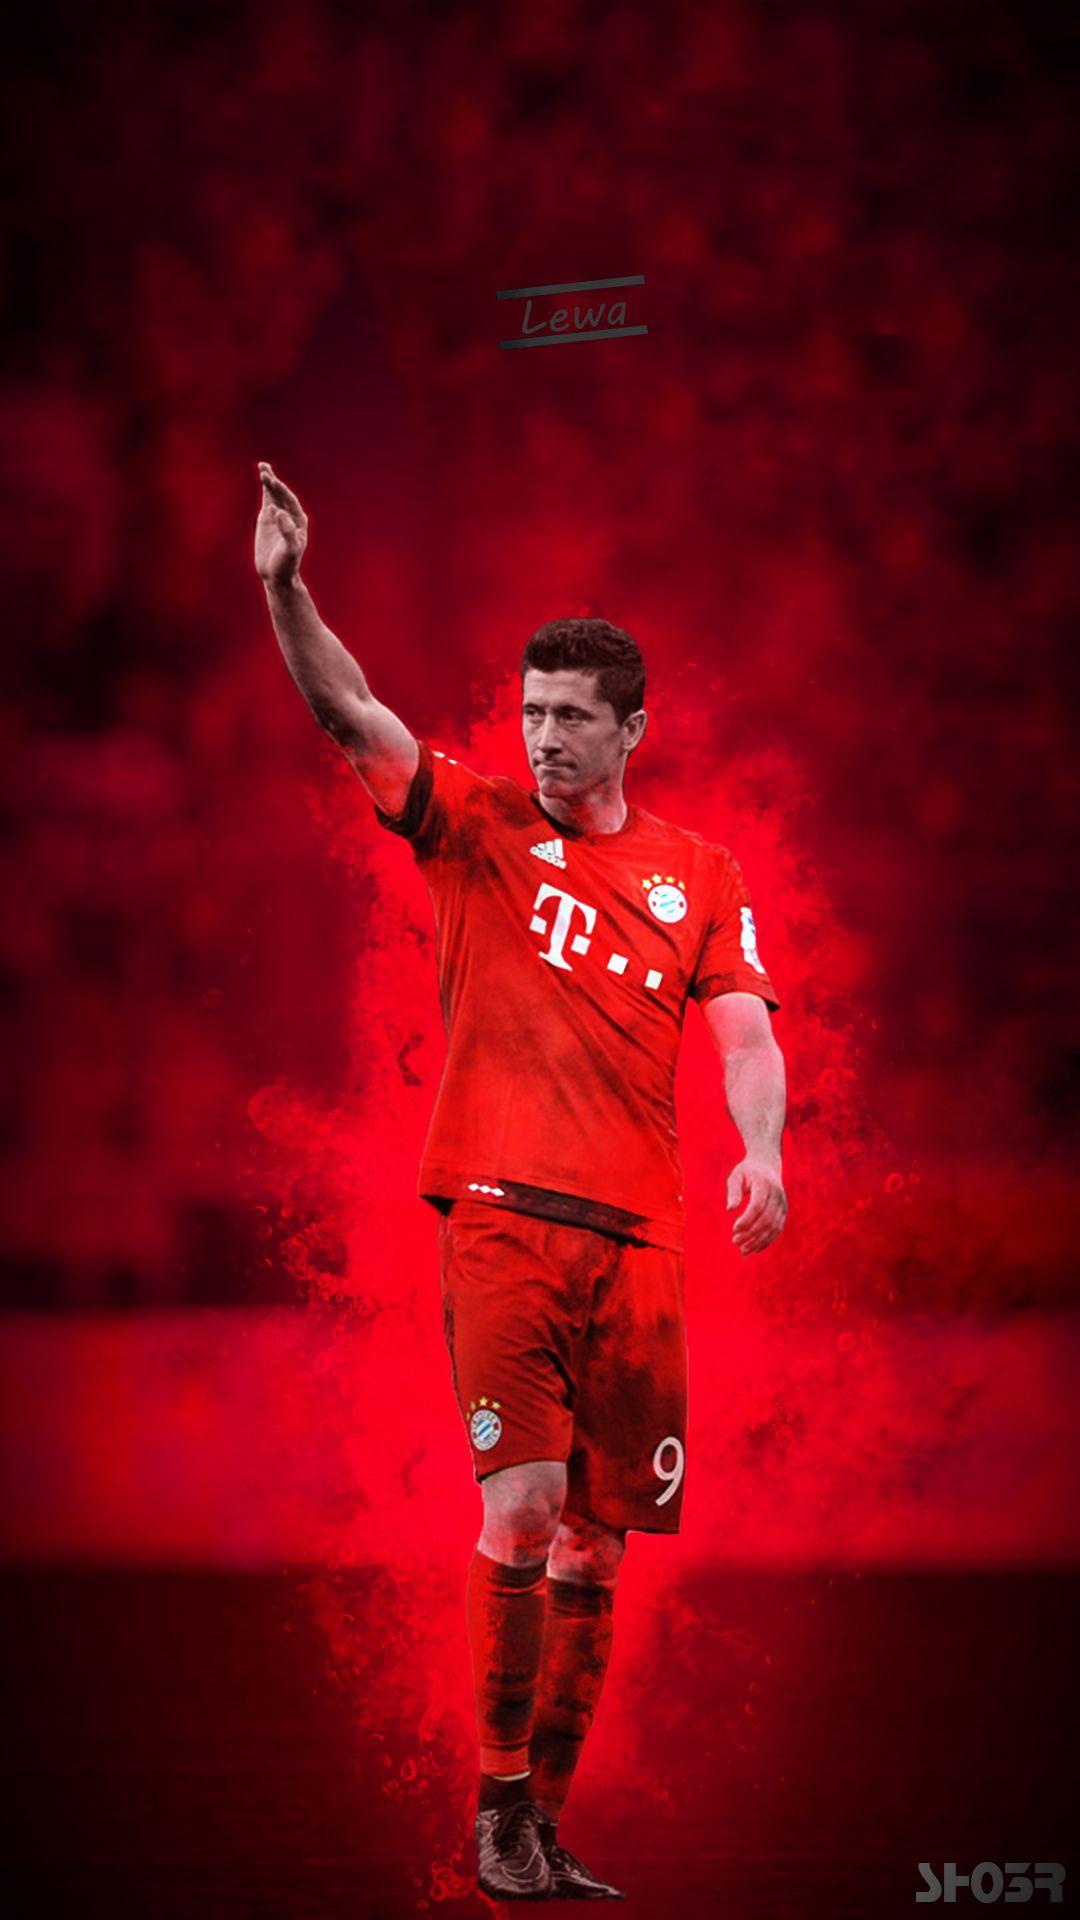 Bayern Lewandowski Sh03r Edits Designfootball Footballedits Footballedit Football Soccer Socceredit Socceredits